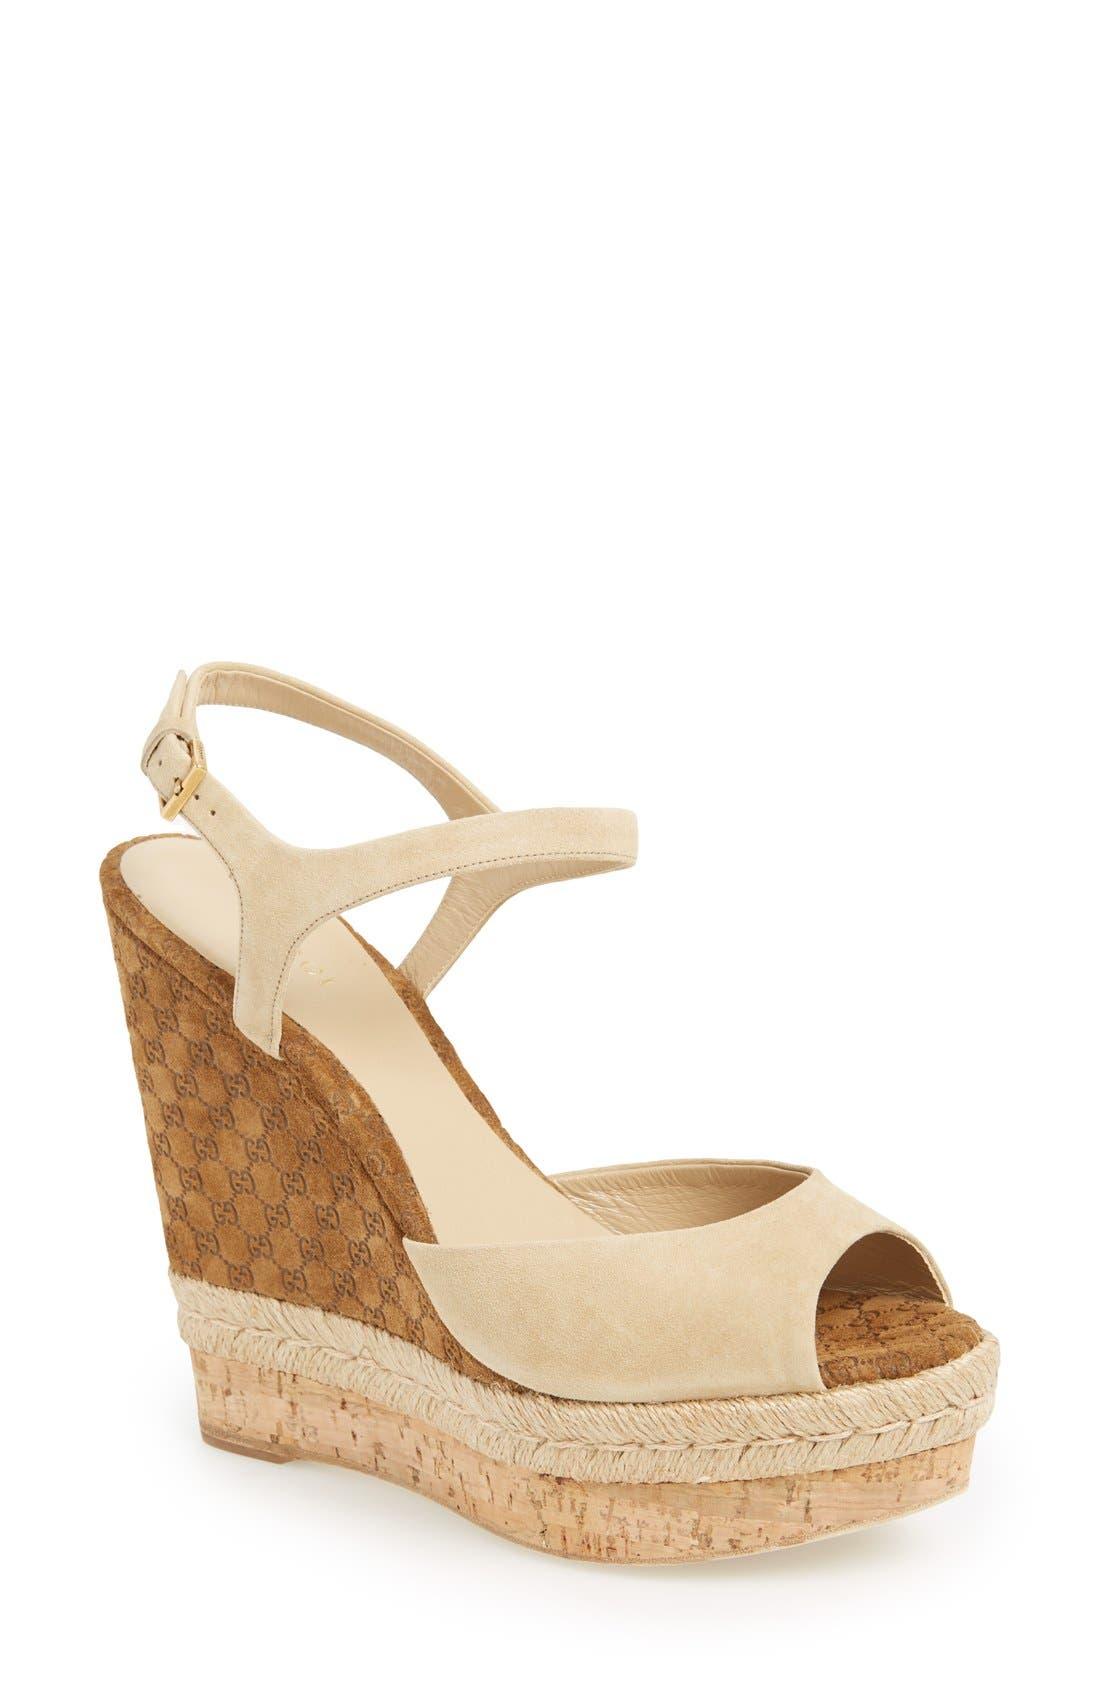 Main Image - Gucci 'Hollie' Wedge Sandal (Women)